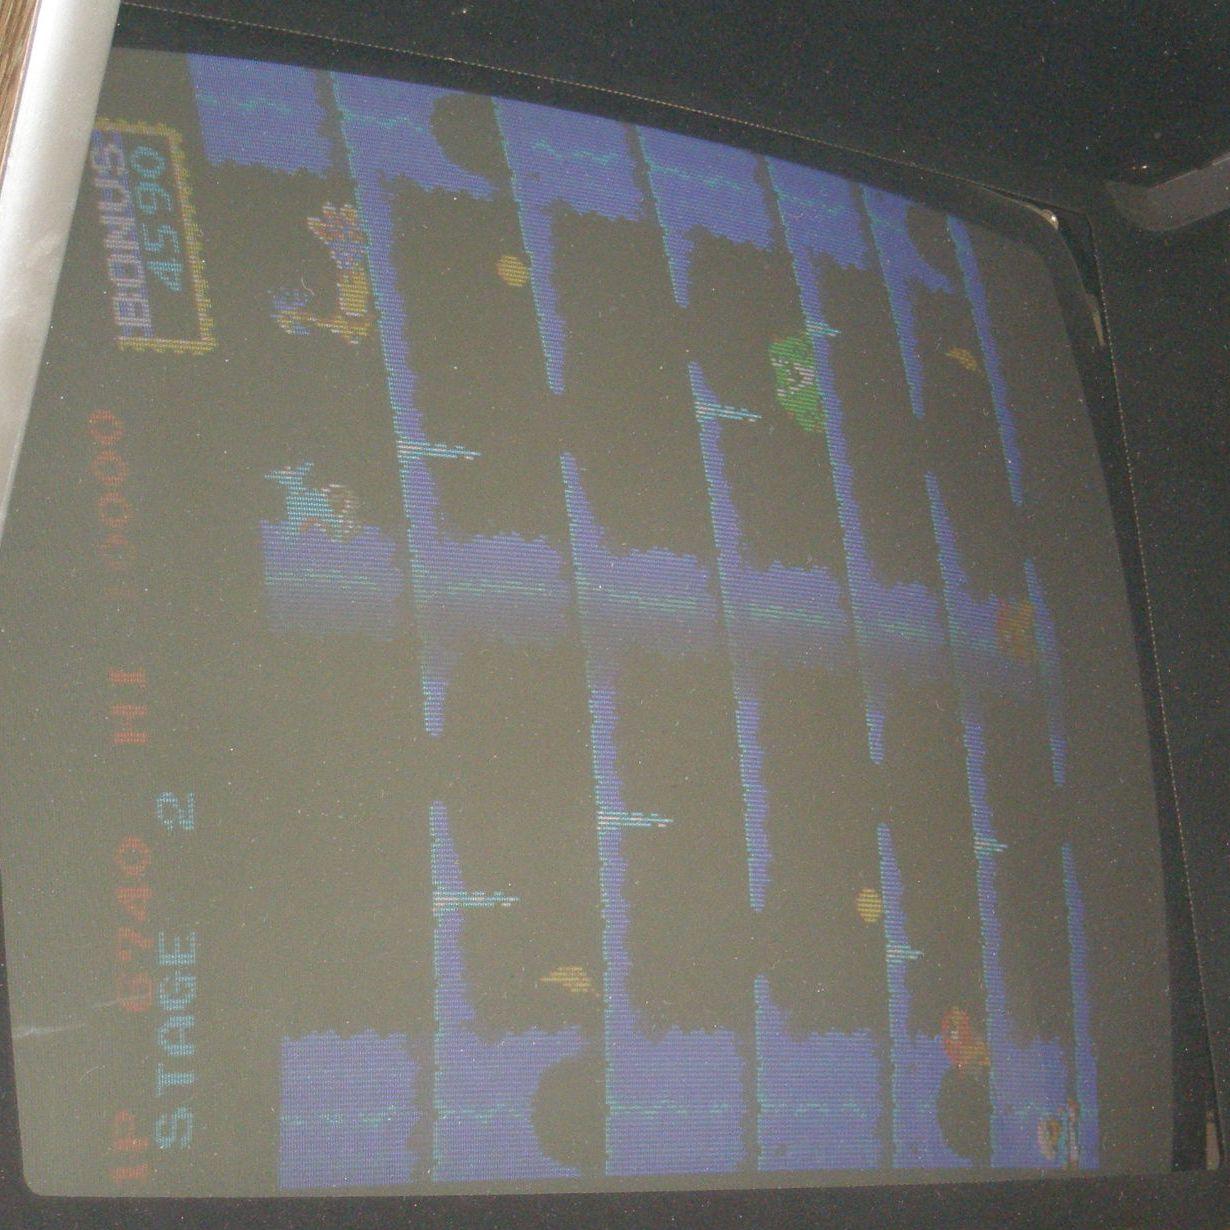 http://arcadius.esero.net/Arcade/Games/Non_Jamma_Fully_Working/Rock_n_Rope_06.jpg